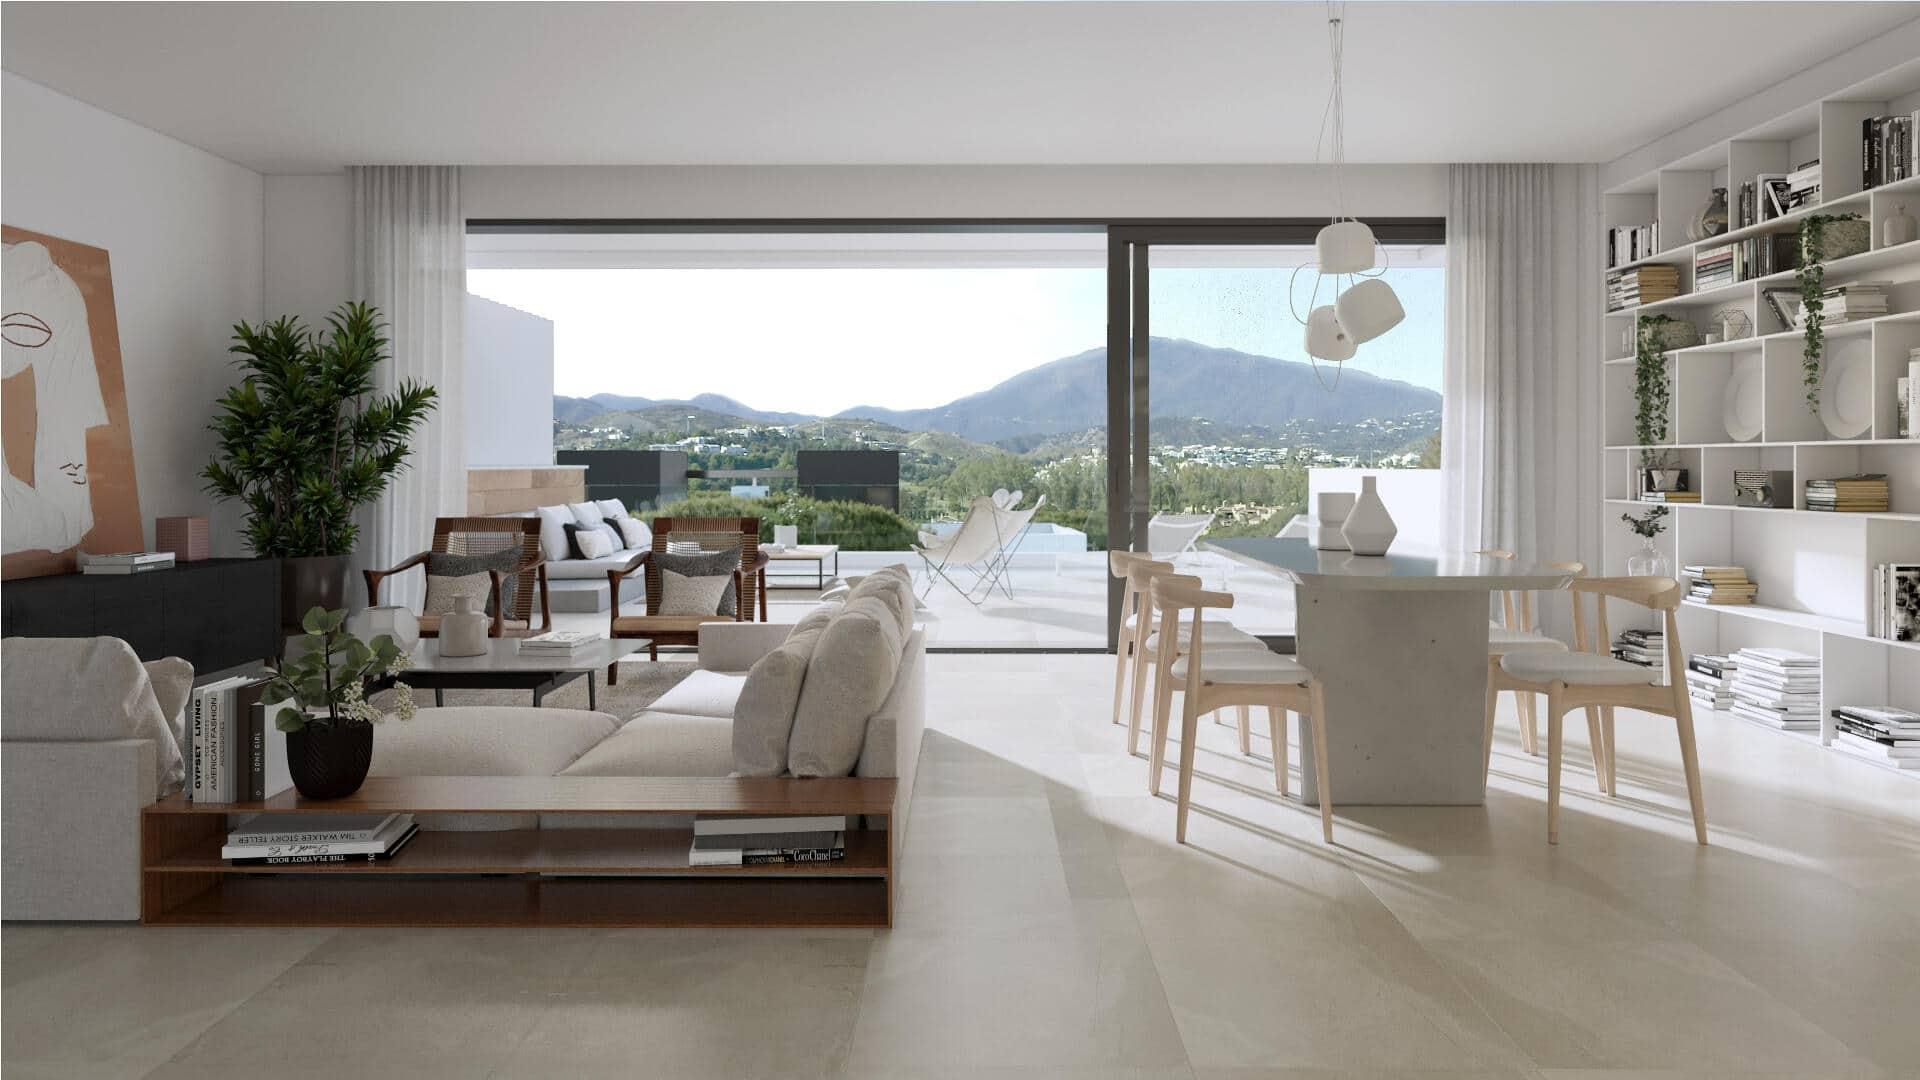 Serene Atalaya semi-detached villa with 3 bedrooms and solarium enjoying great open views towards the sea